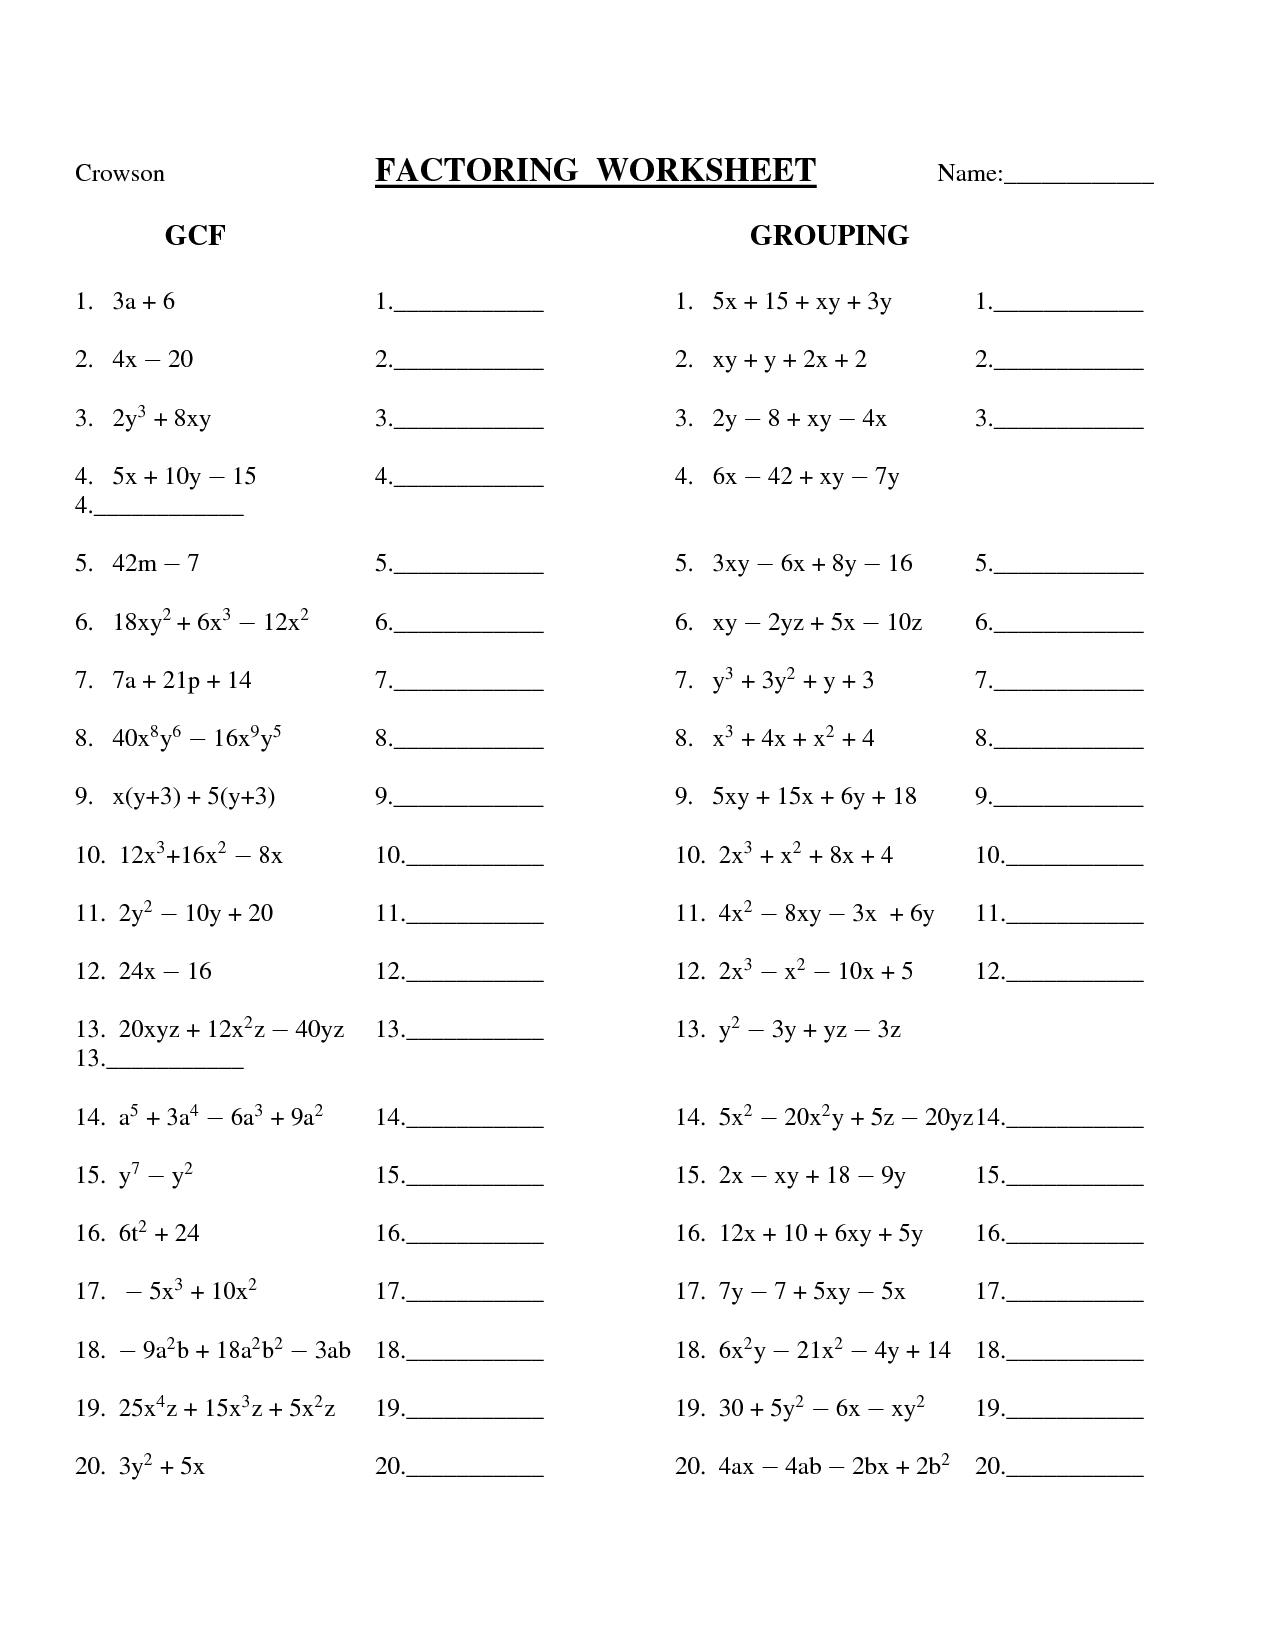 18 Best Images Of Factoring Polynomials Worksheet